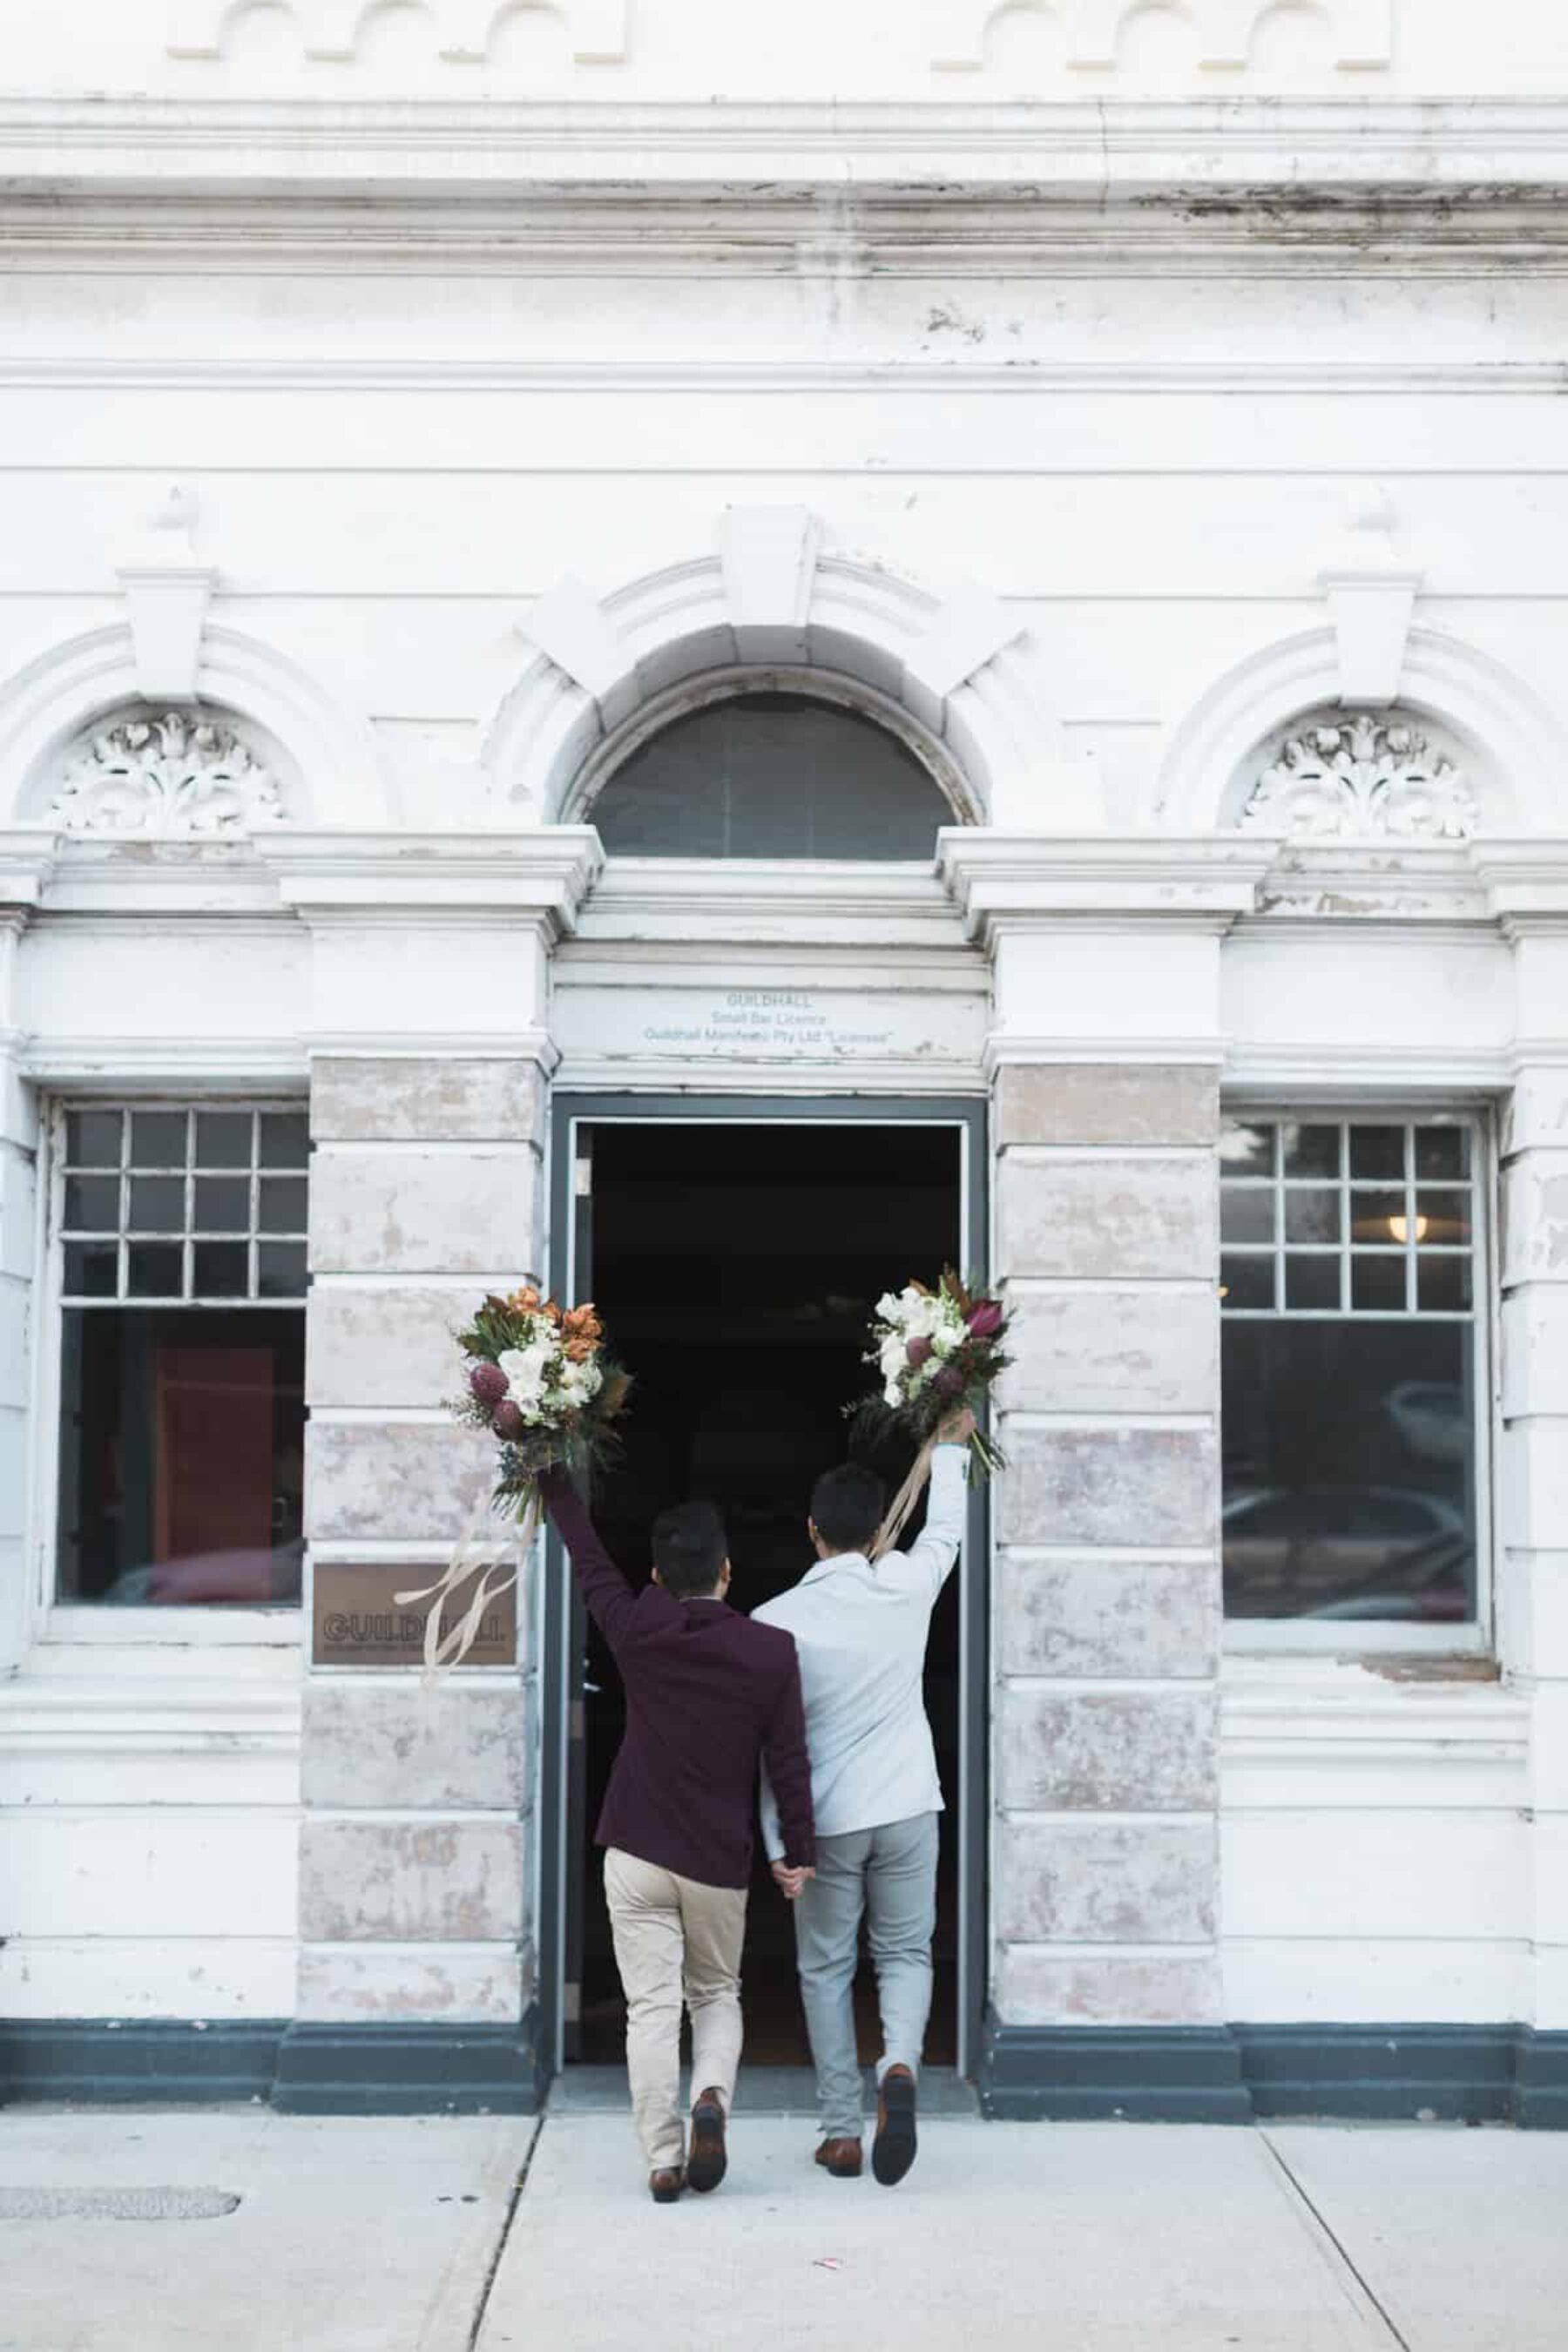 Stylish winter wedding at Fremantle's Guildhall